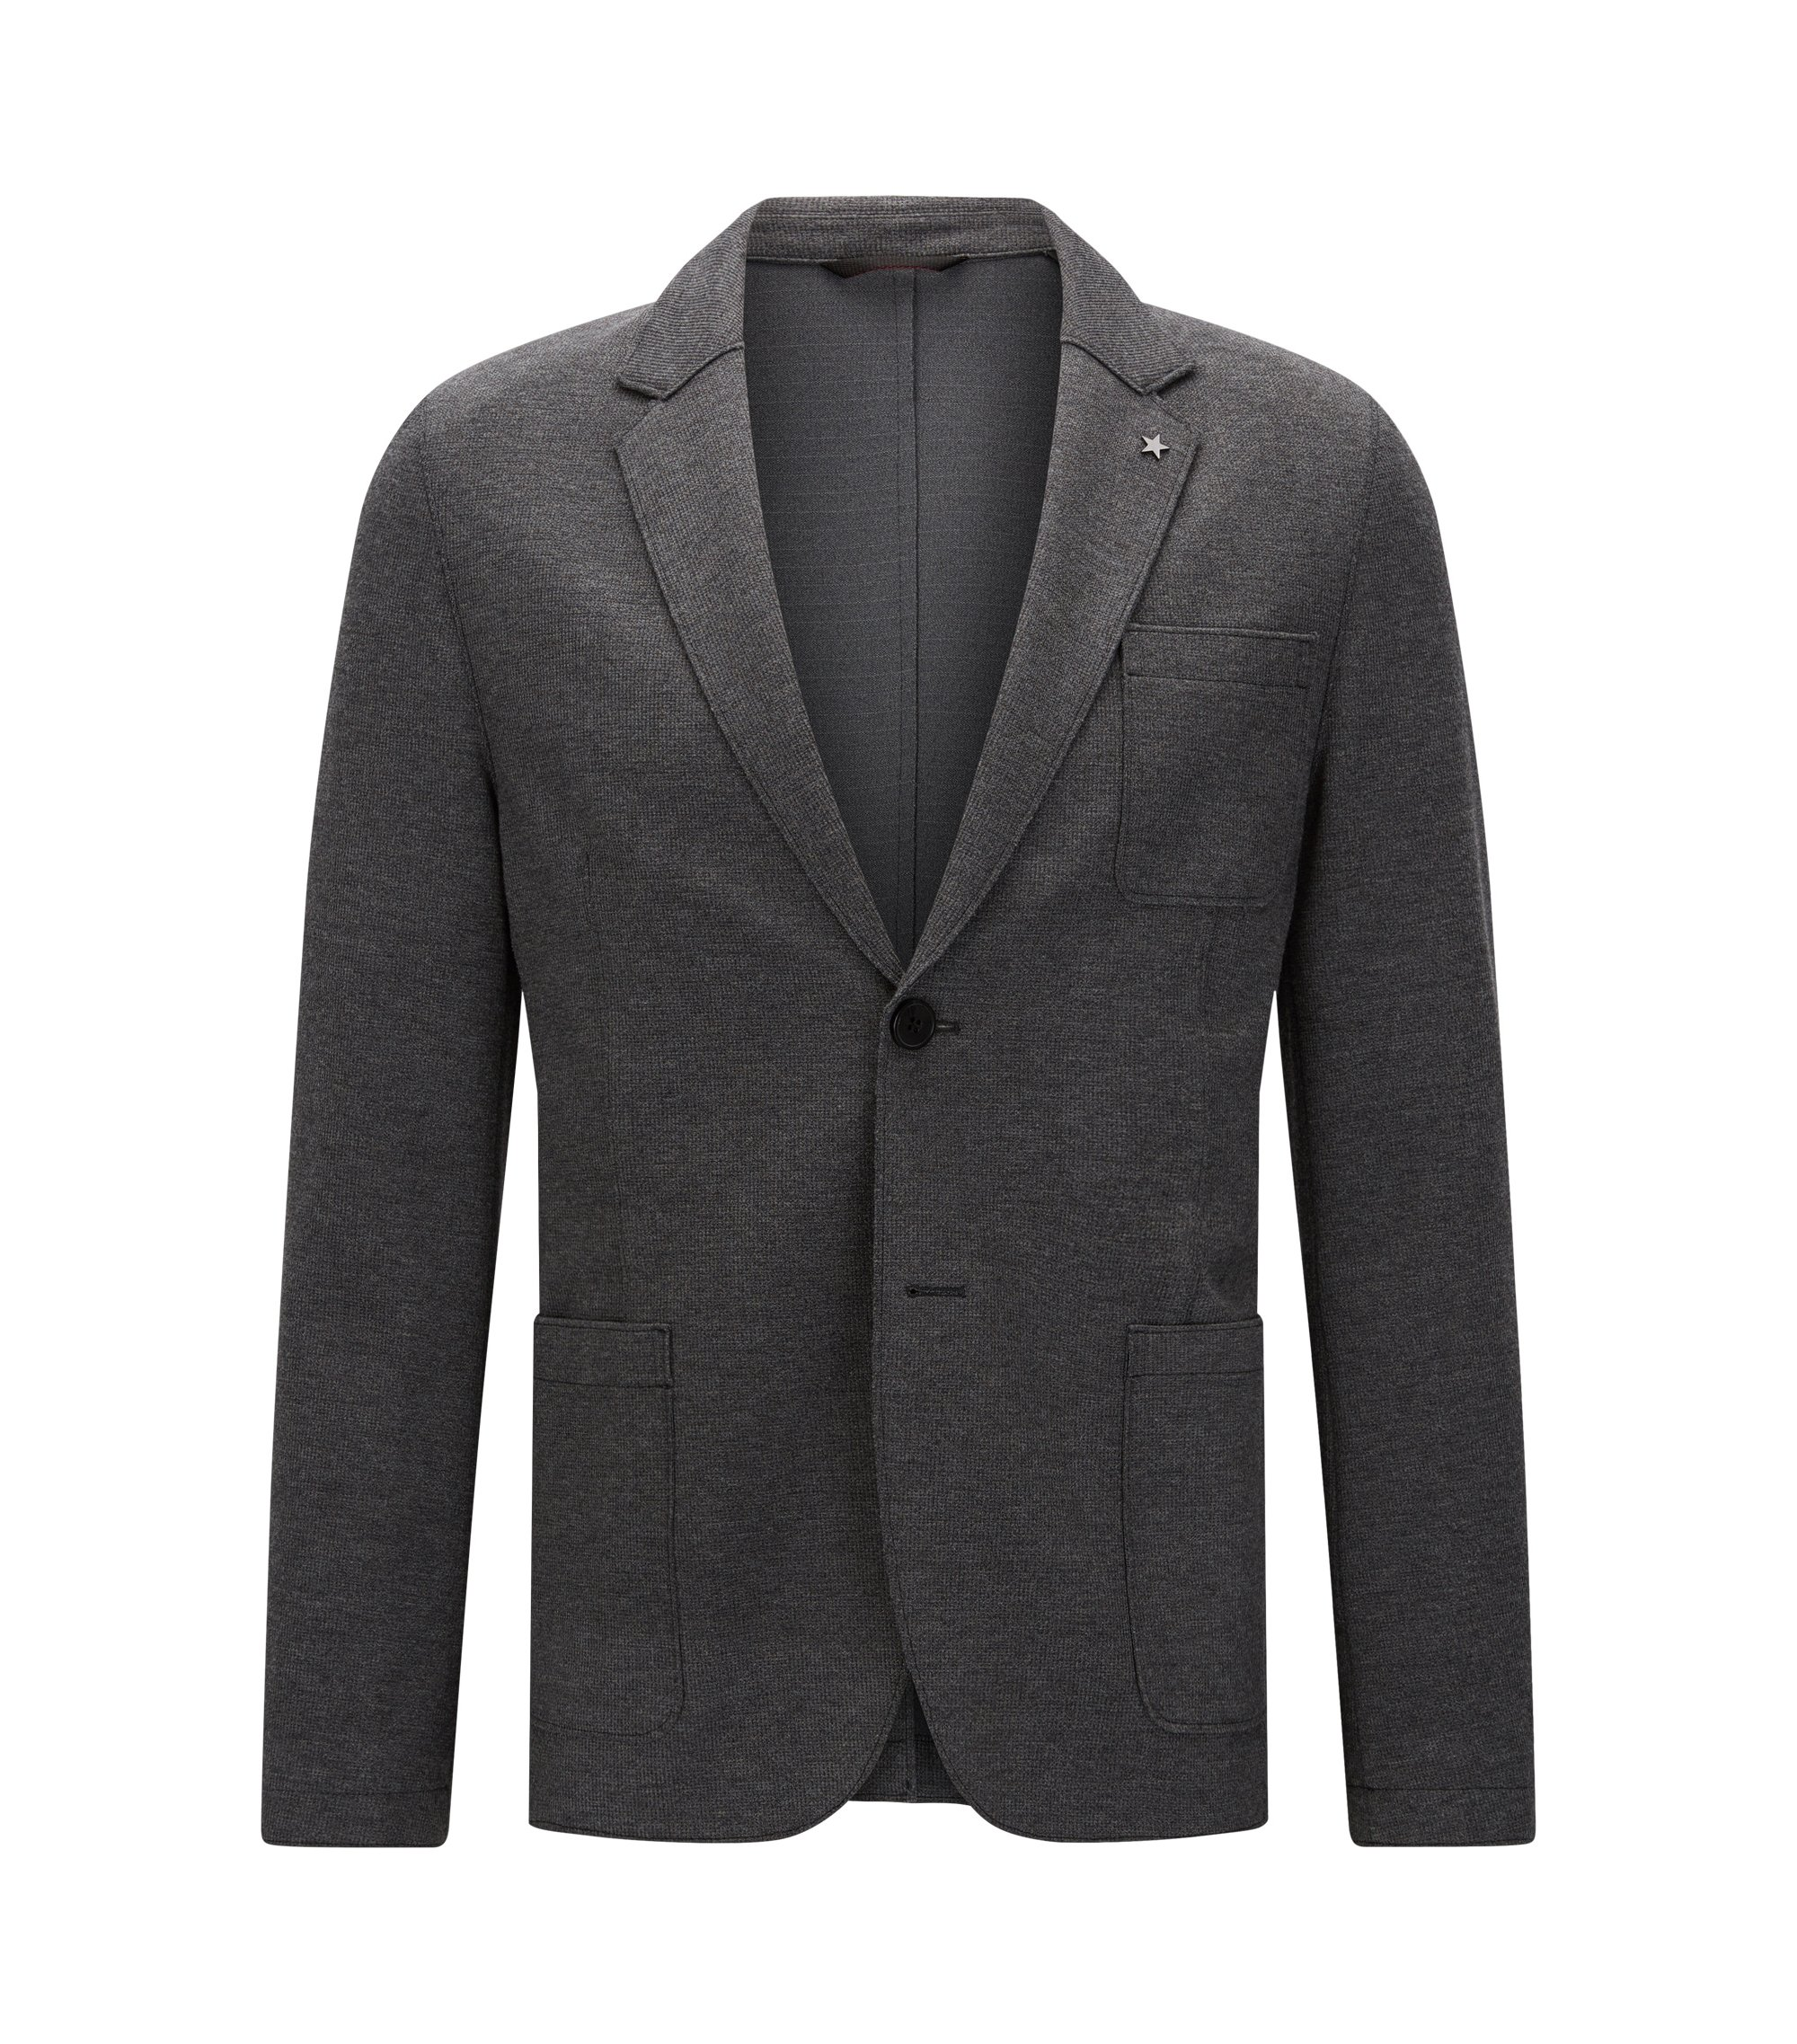 Stretch Blend Sport Coat, Slim Fit | Agalton, Grey